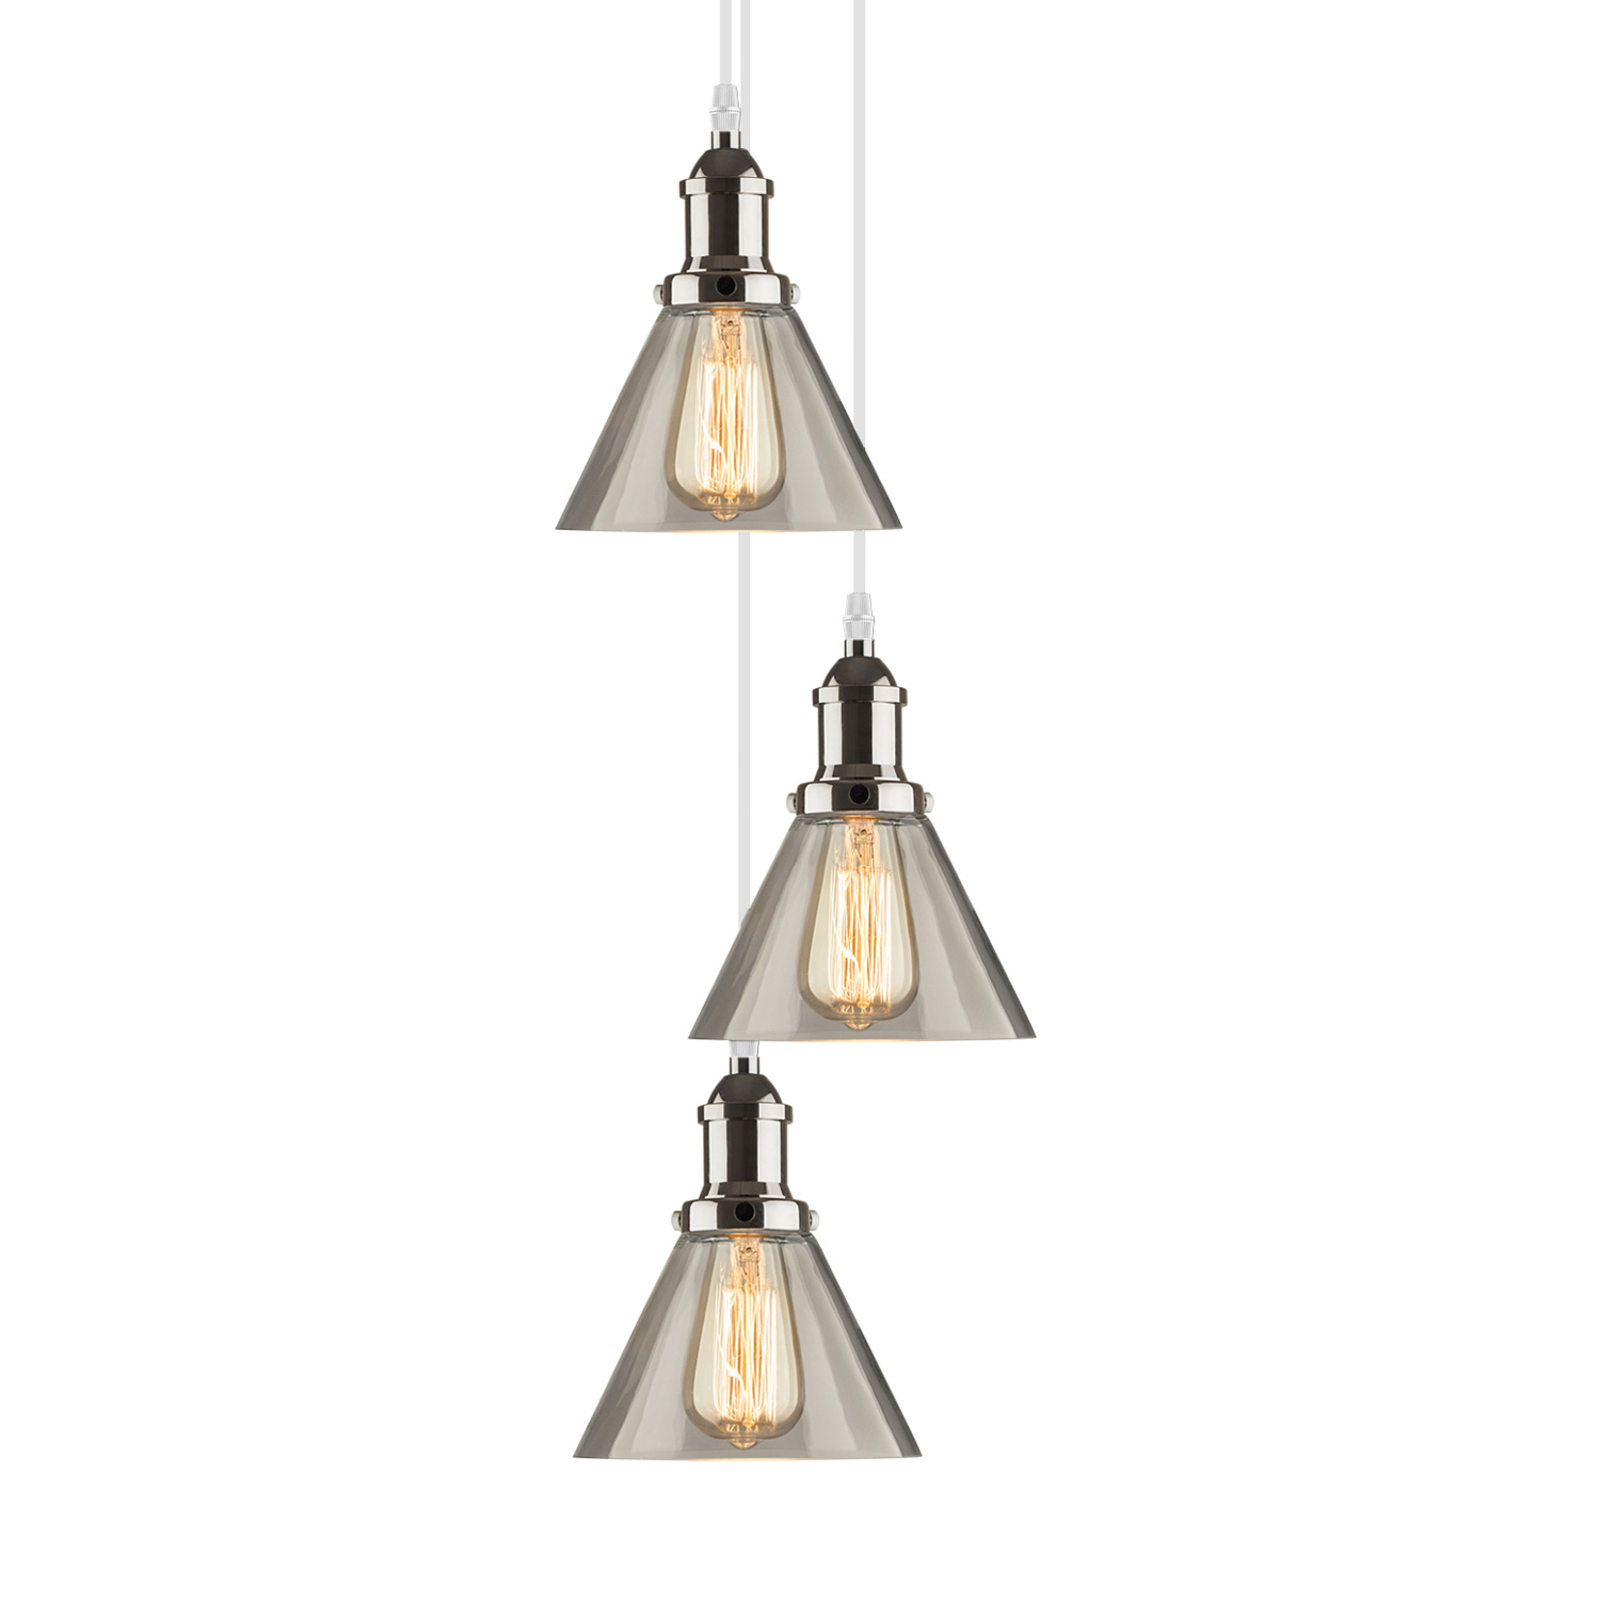 Hanglamp LA034 E27 3-lamps chroom/rookgrijs